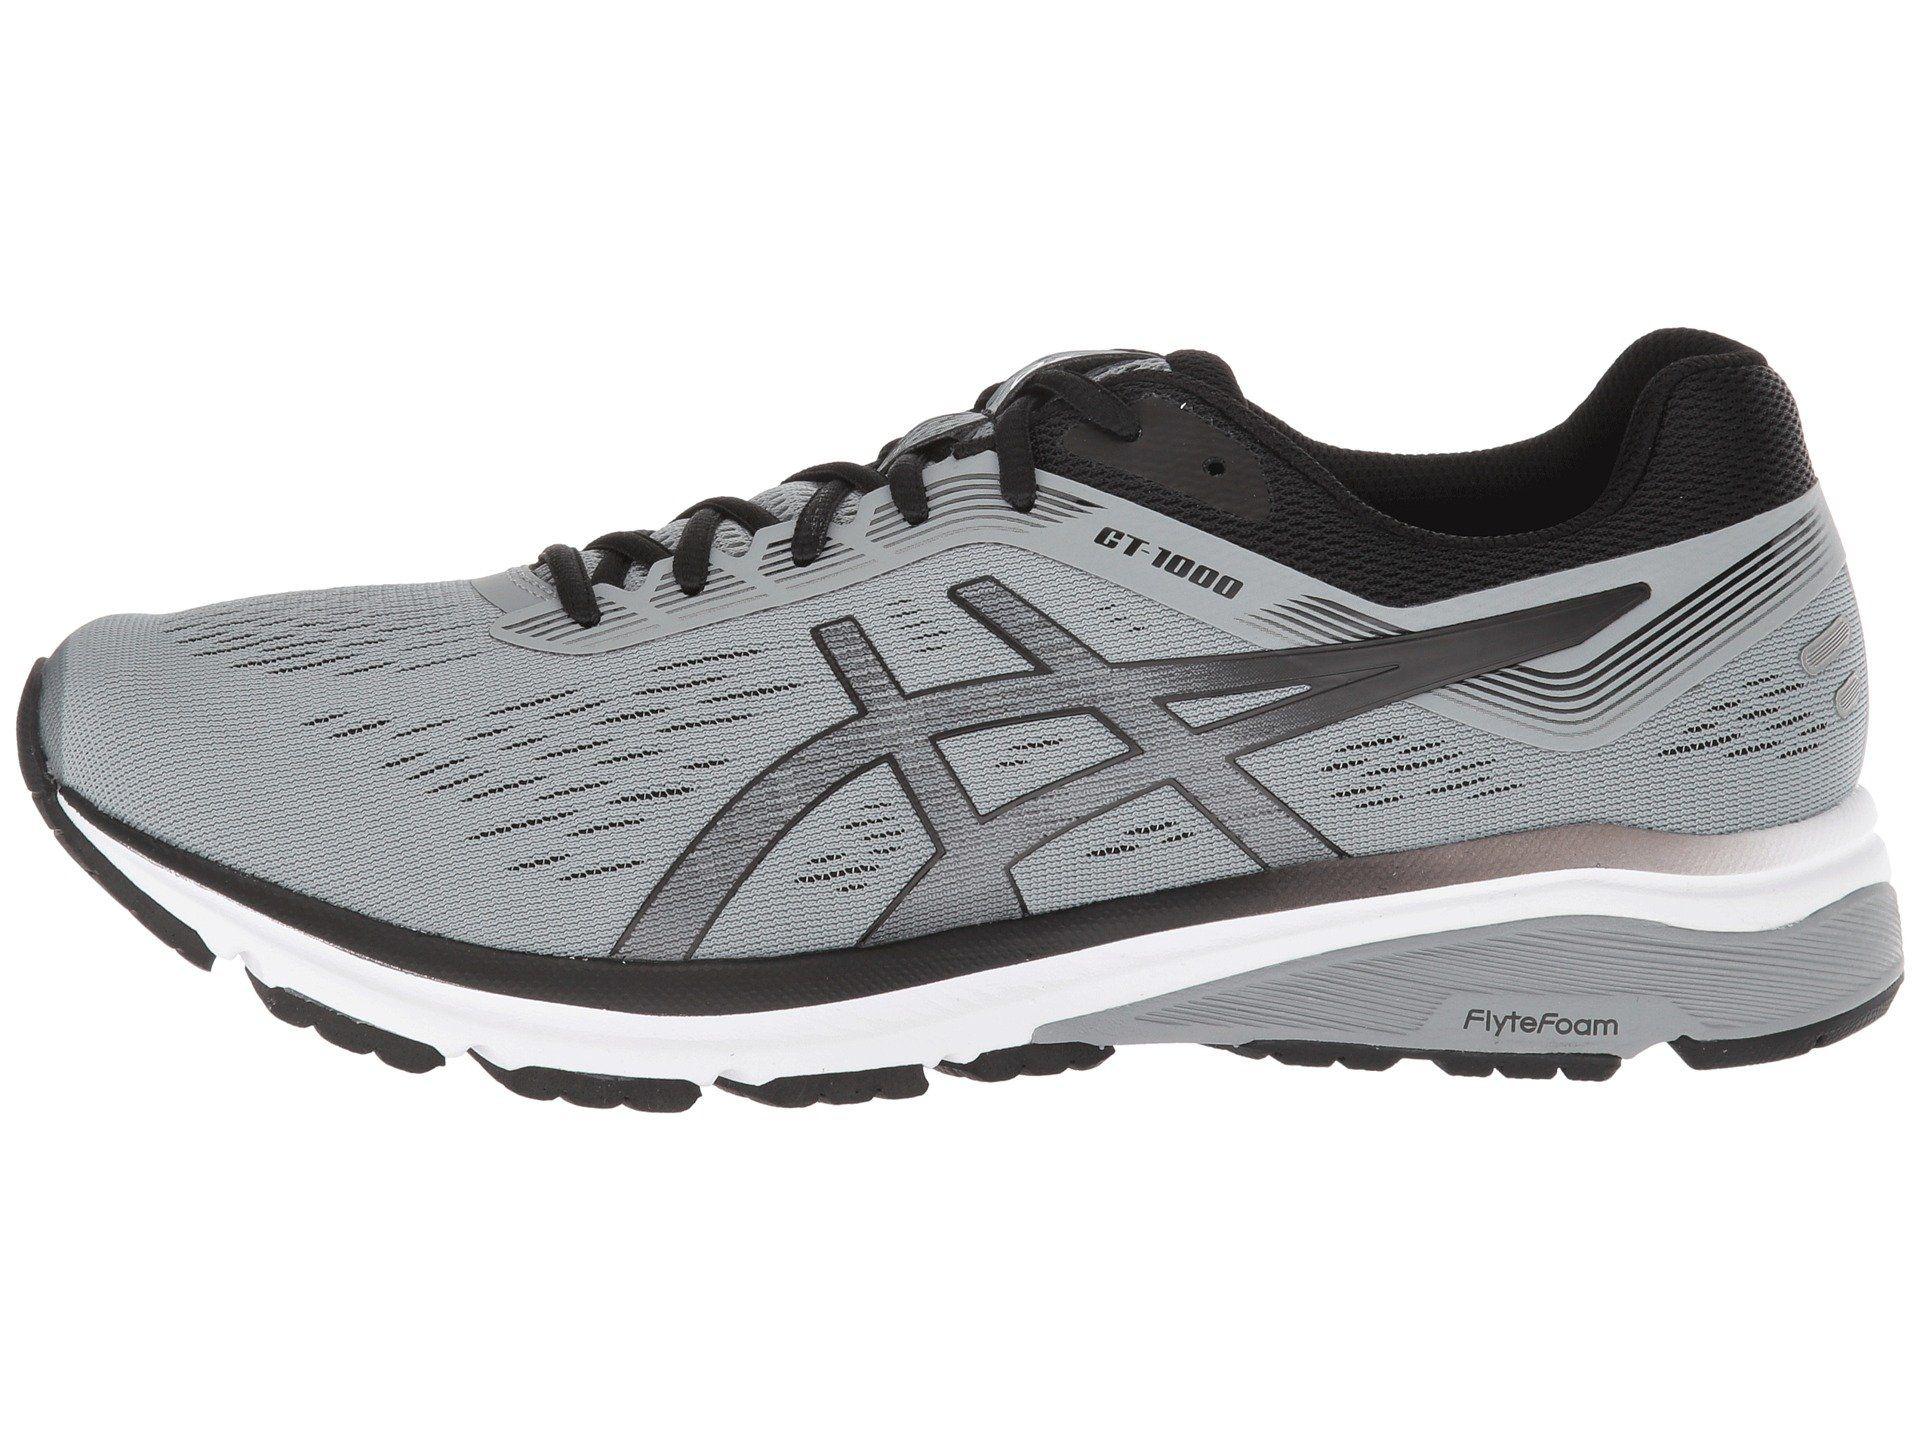 Asics Running Shoes | Best Asics Shoes 2019